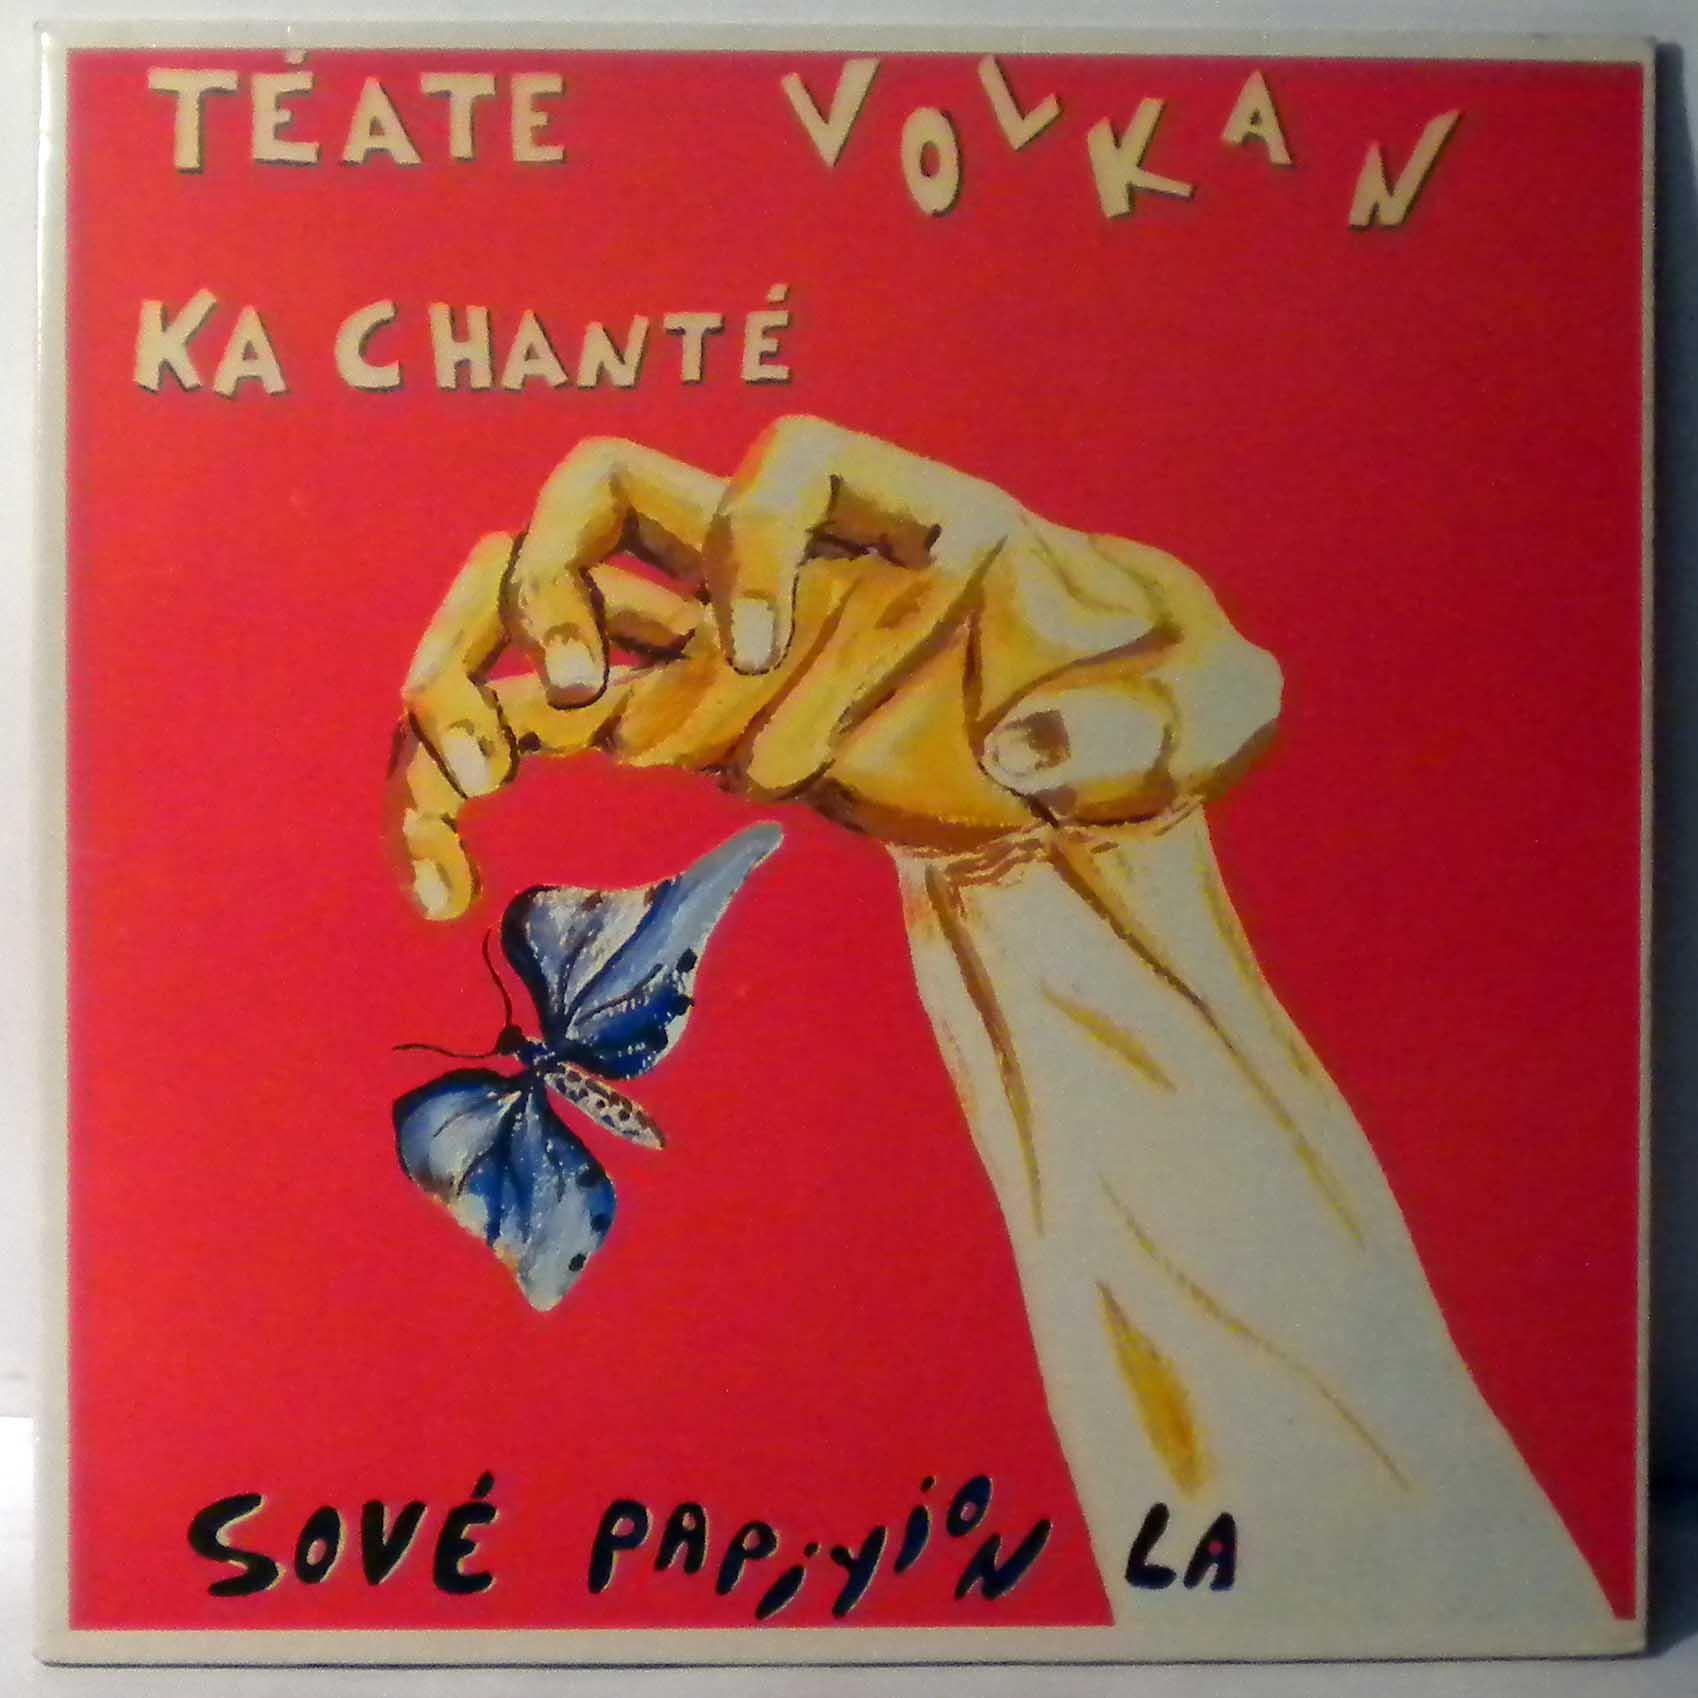 TEATE VOLKAN - Ka Chante - LP